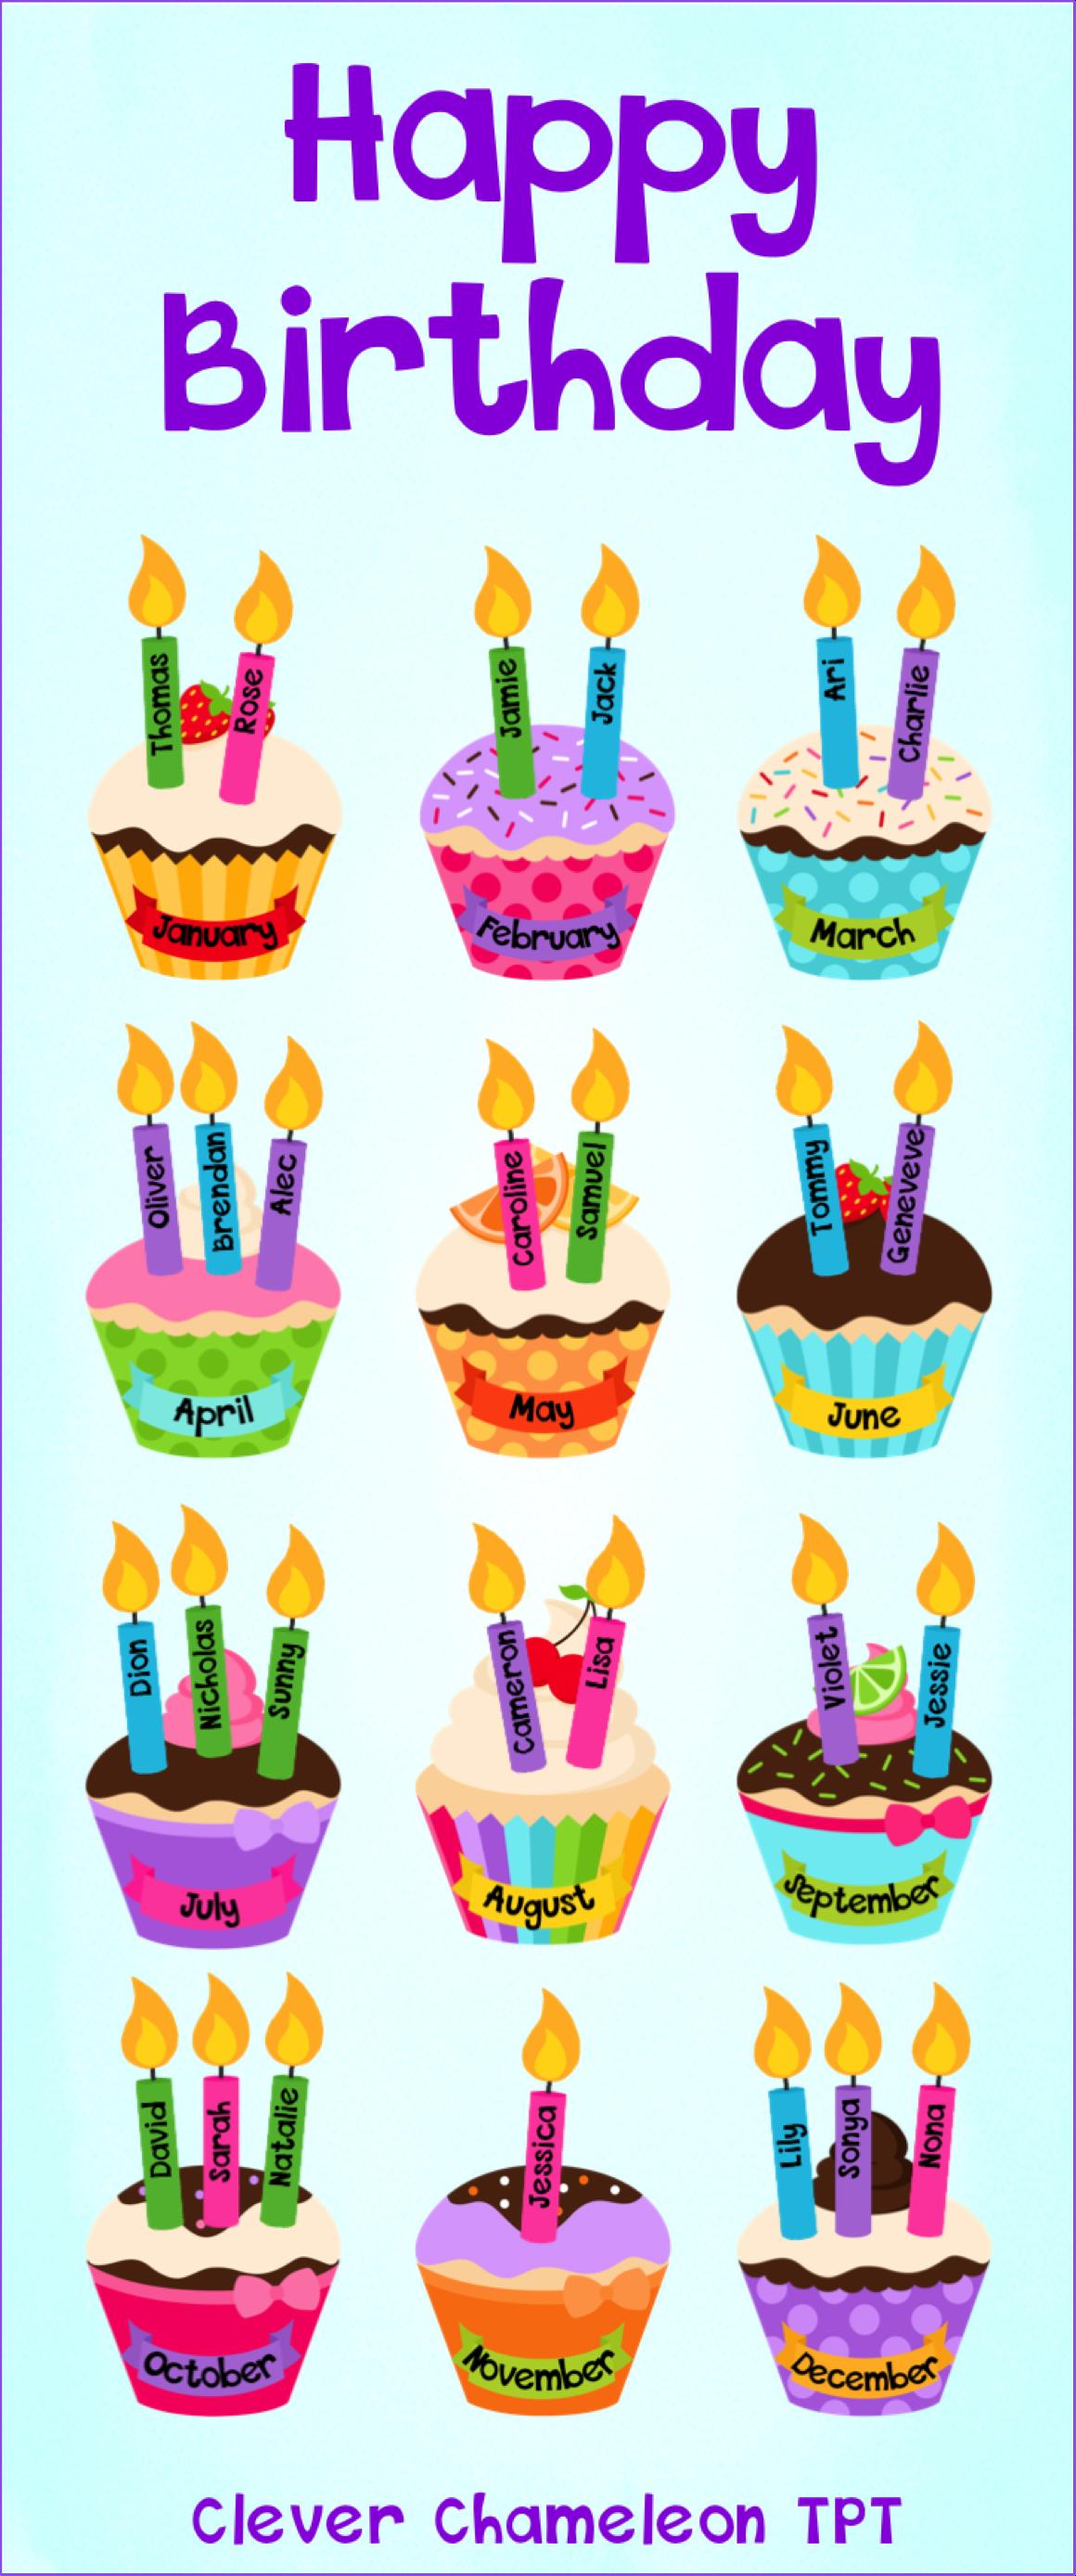 Birthday Cupcakes  Cupcake Birthday Display | Tpt Misc regarding Birthday Display Cupcakes